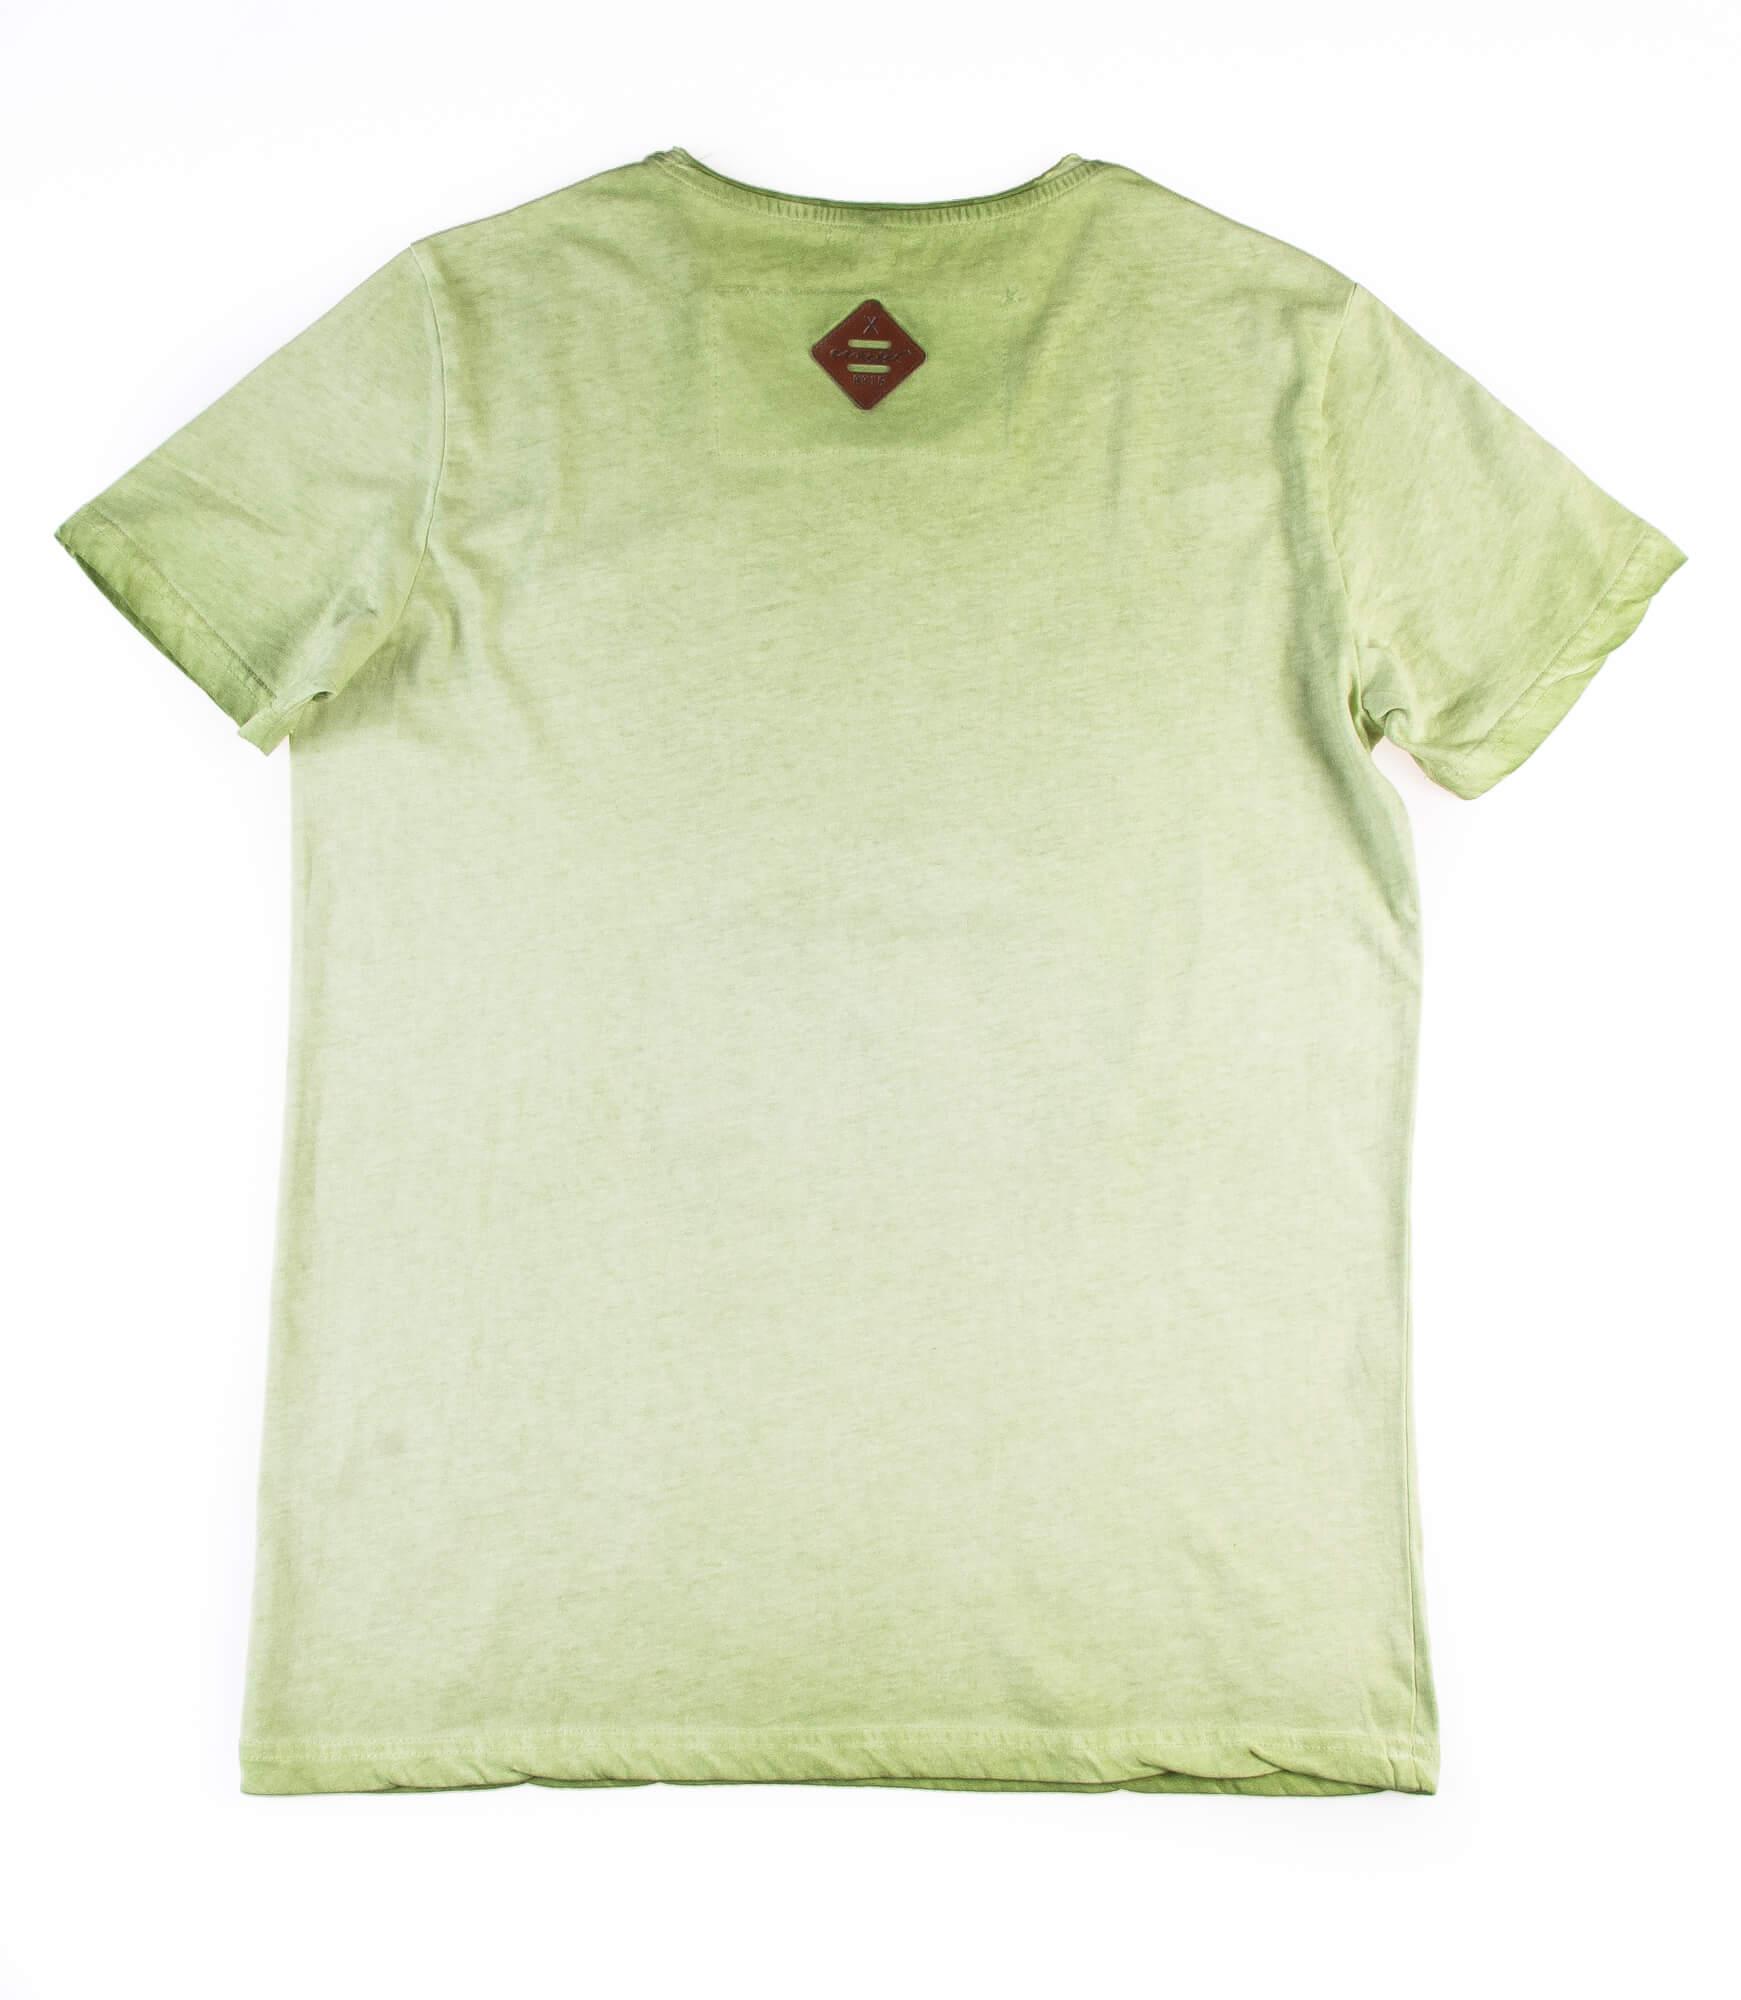 تی شرت مردانه هنگ اور S1031 HANGOWEAR